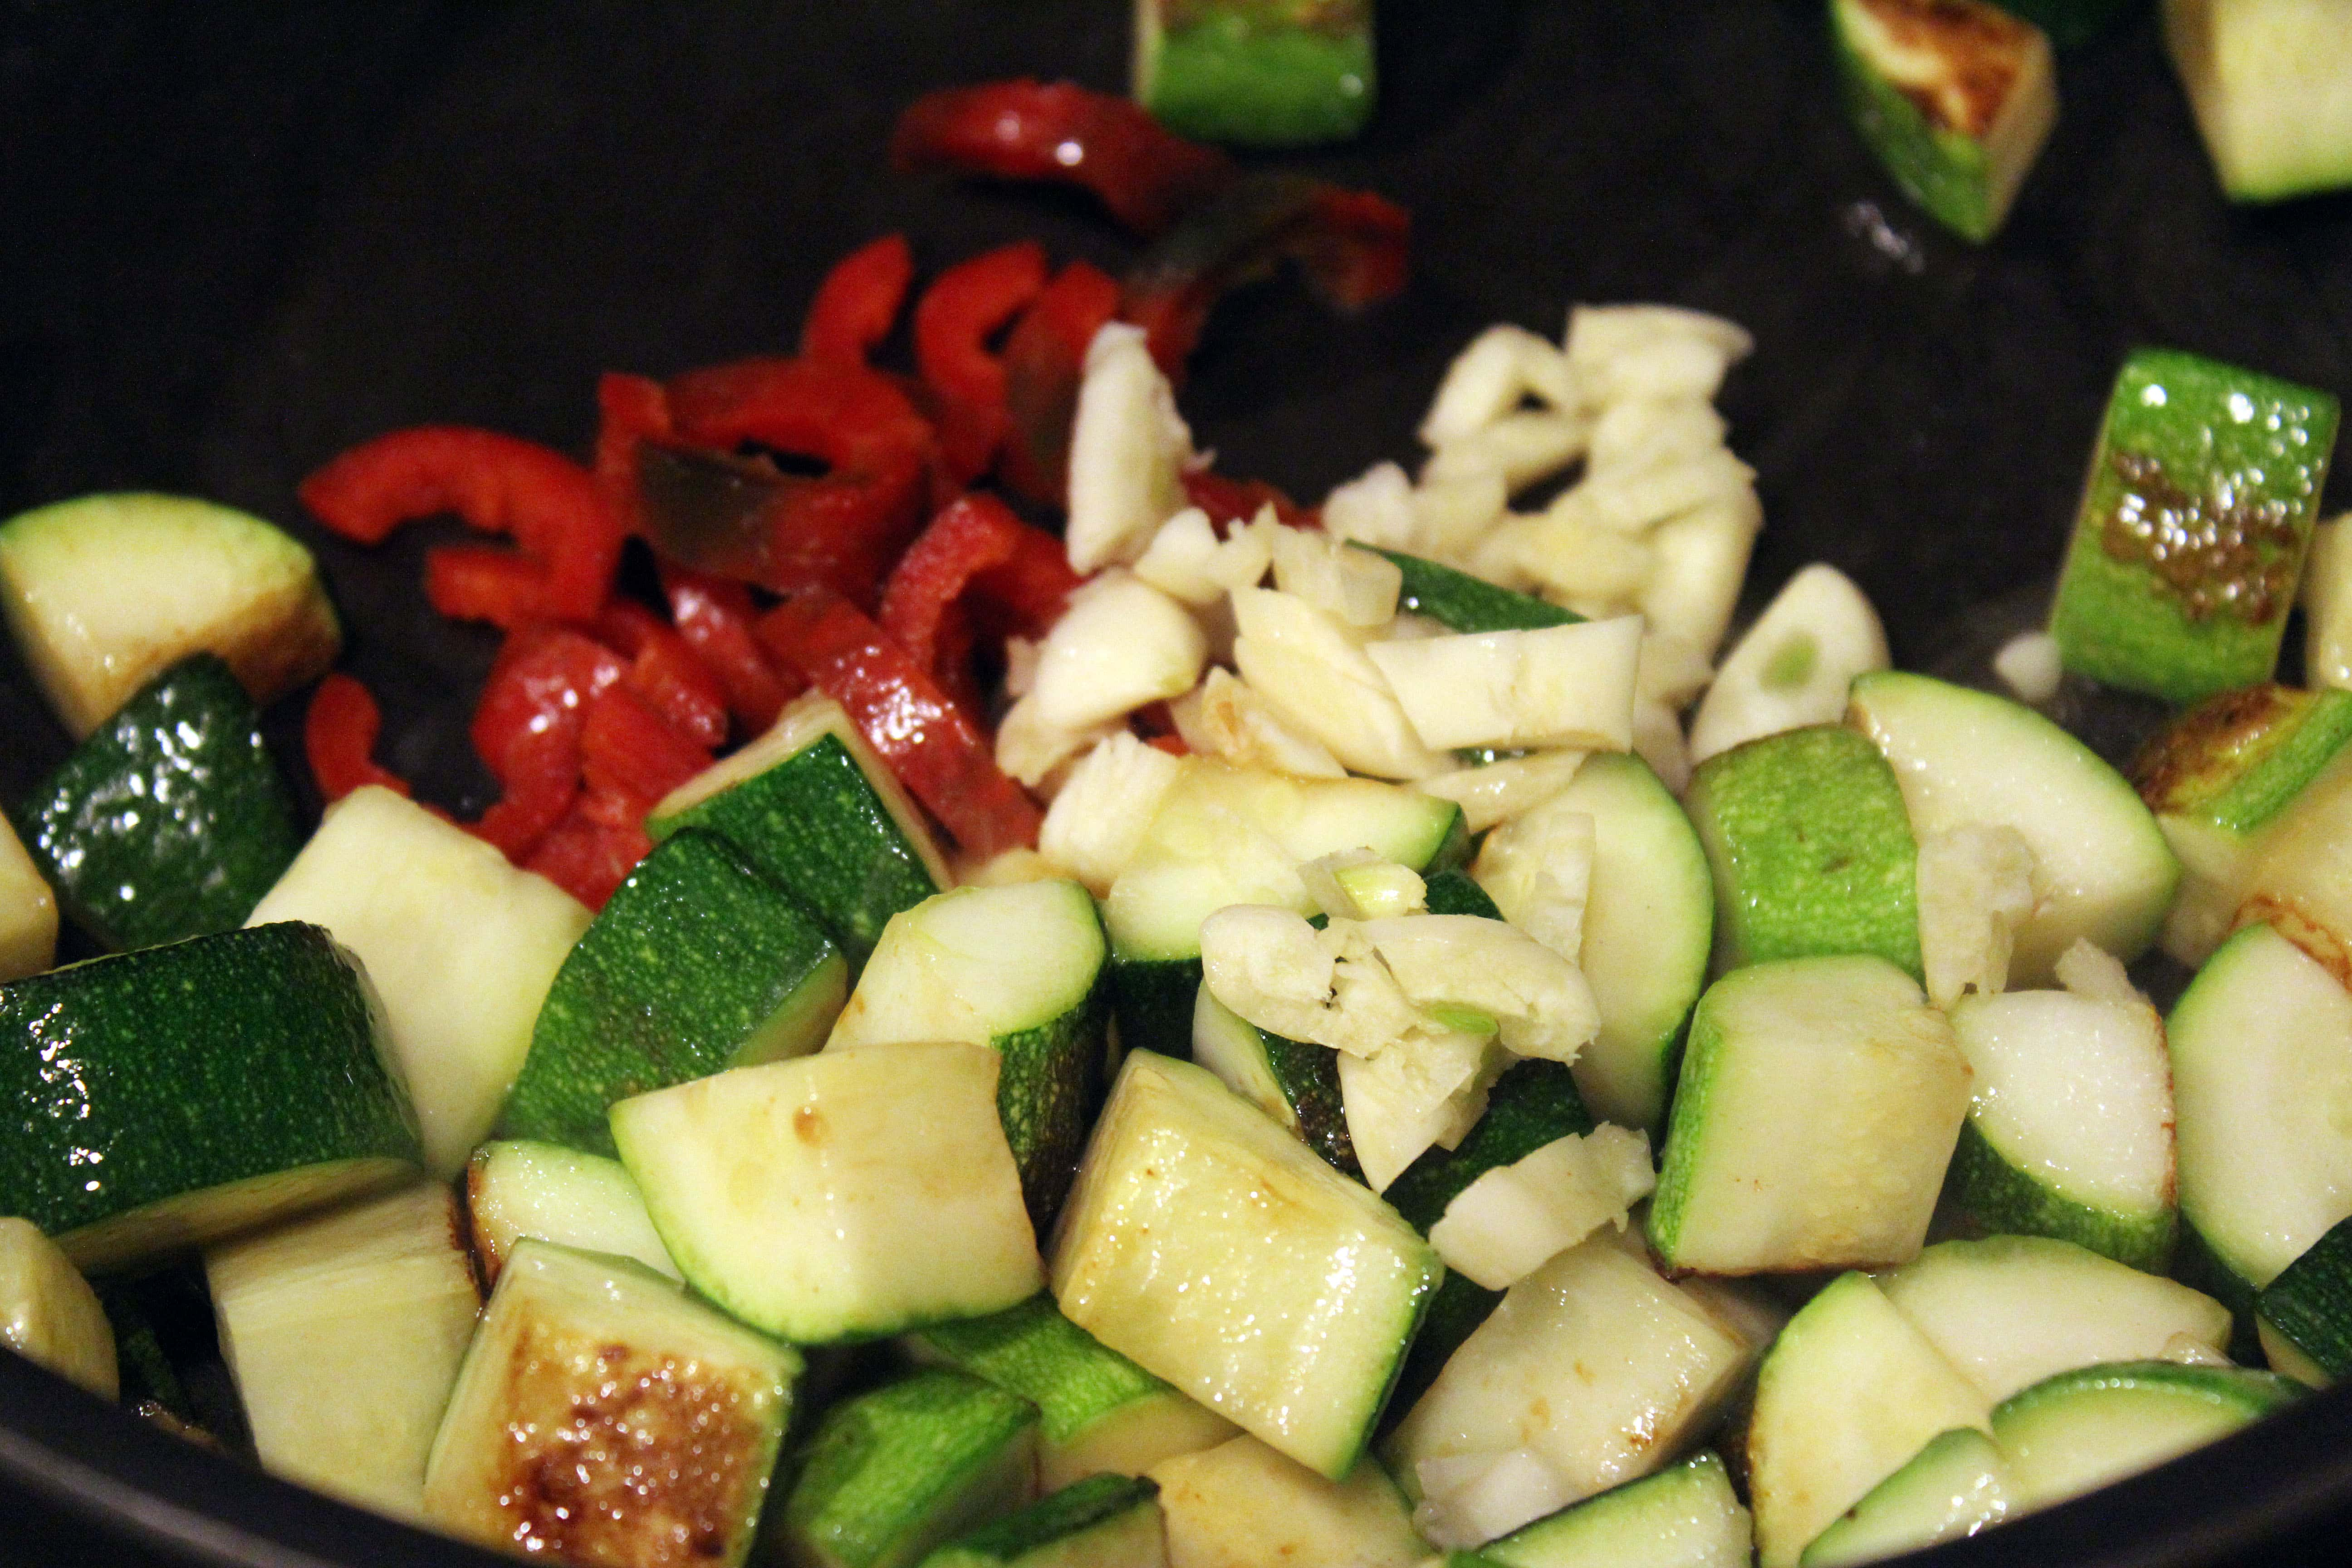 Add garlic and chili to cooked zucchin